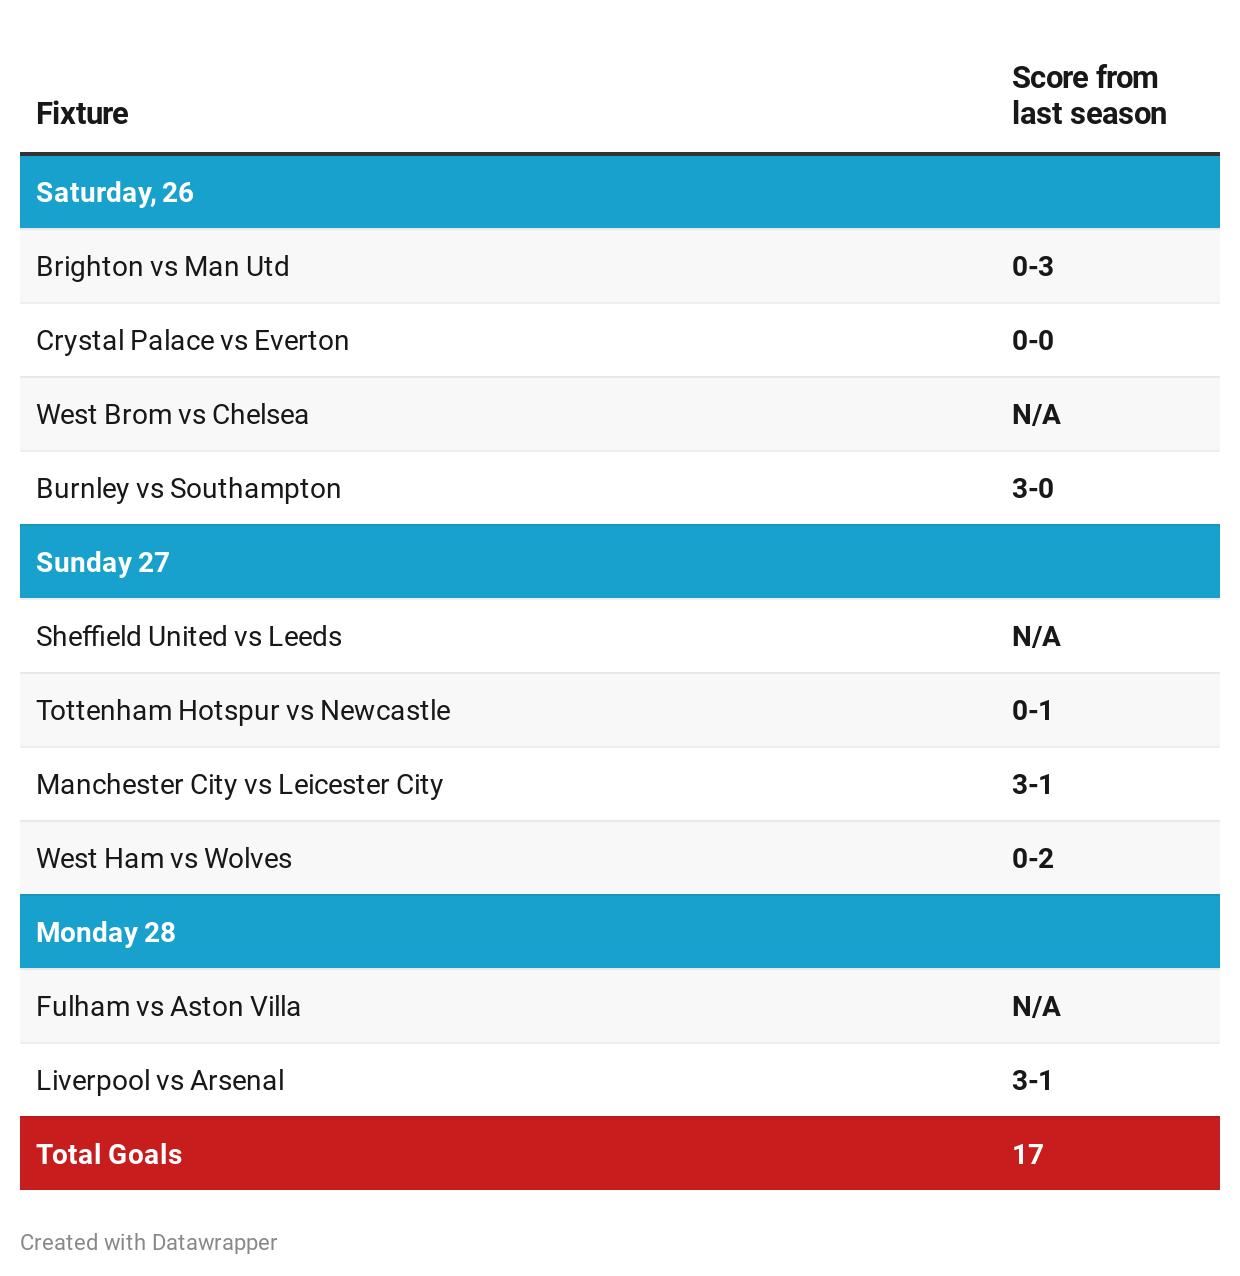 Fixture comparison 201920 and 202021